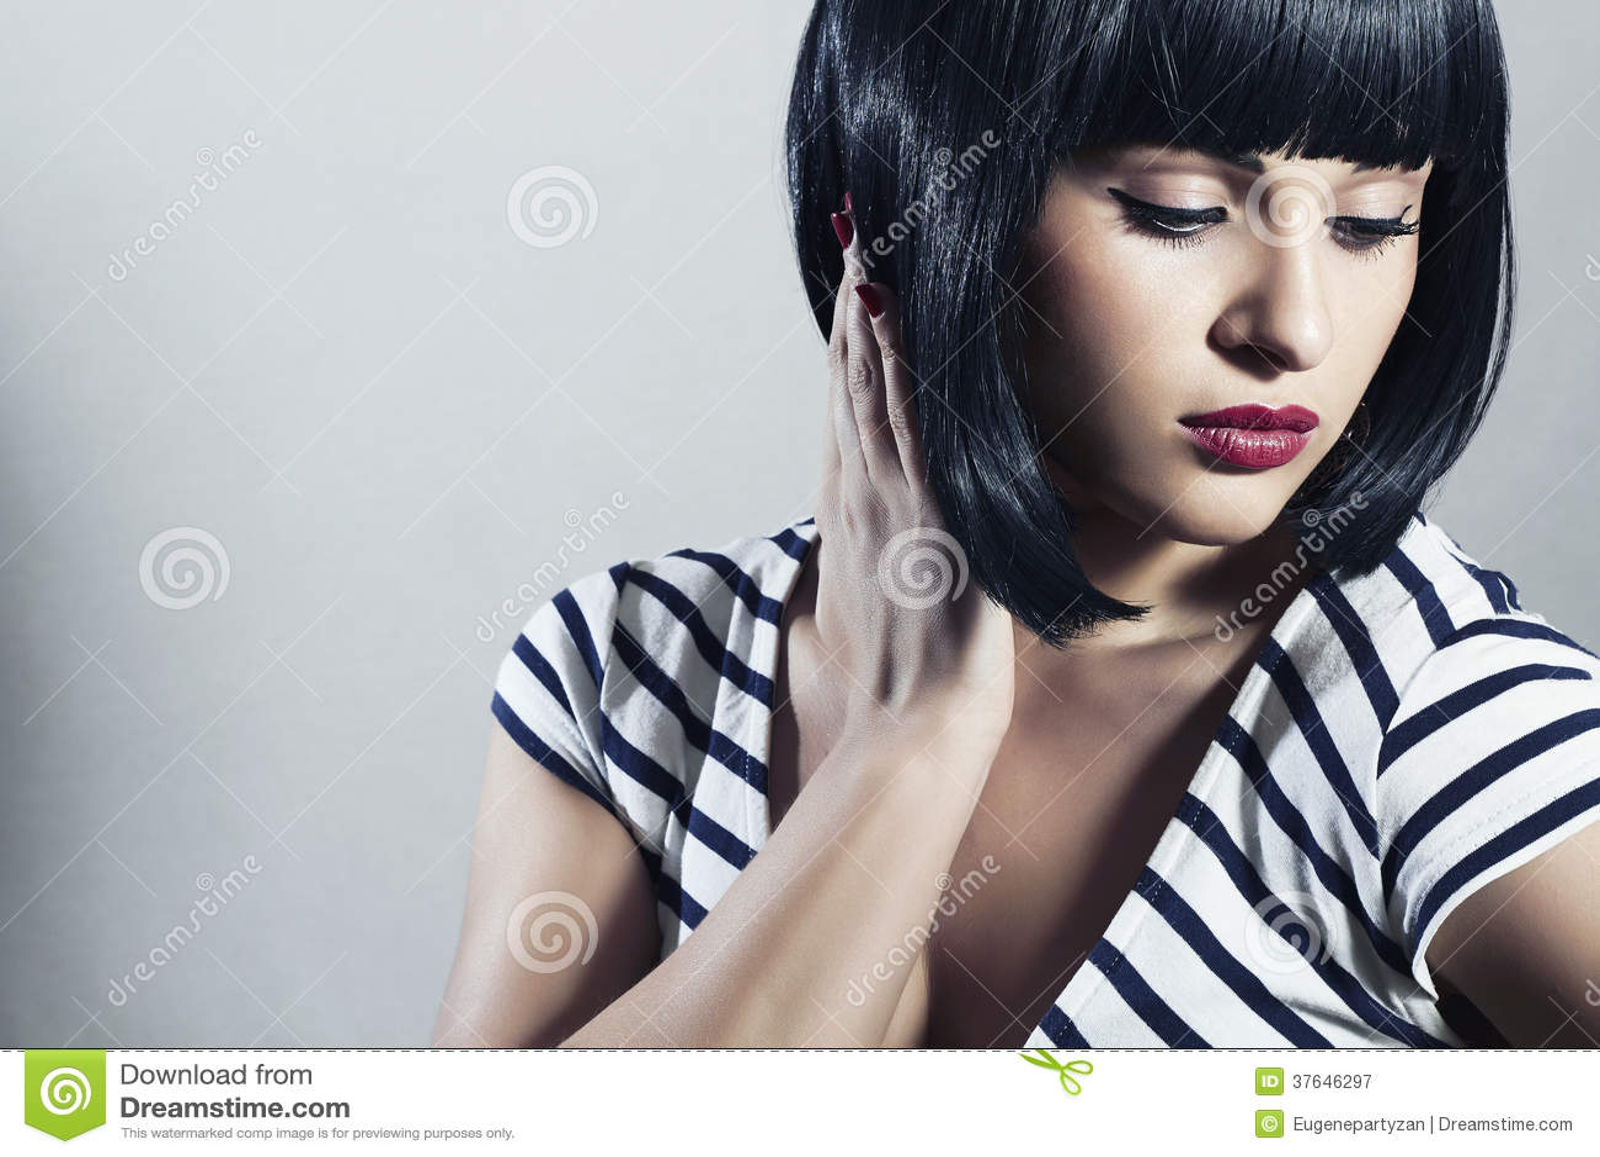 Beautiful Brunette Girl In Dress Black Hair Bob Haircut Red Lips Beauty Woman With Fringe